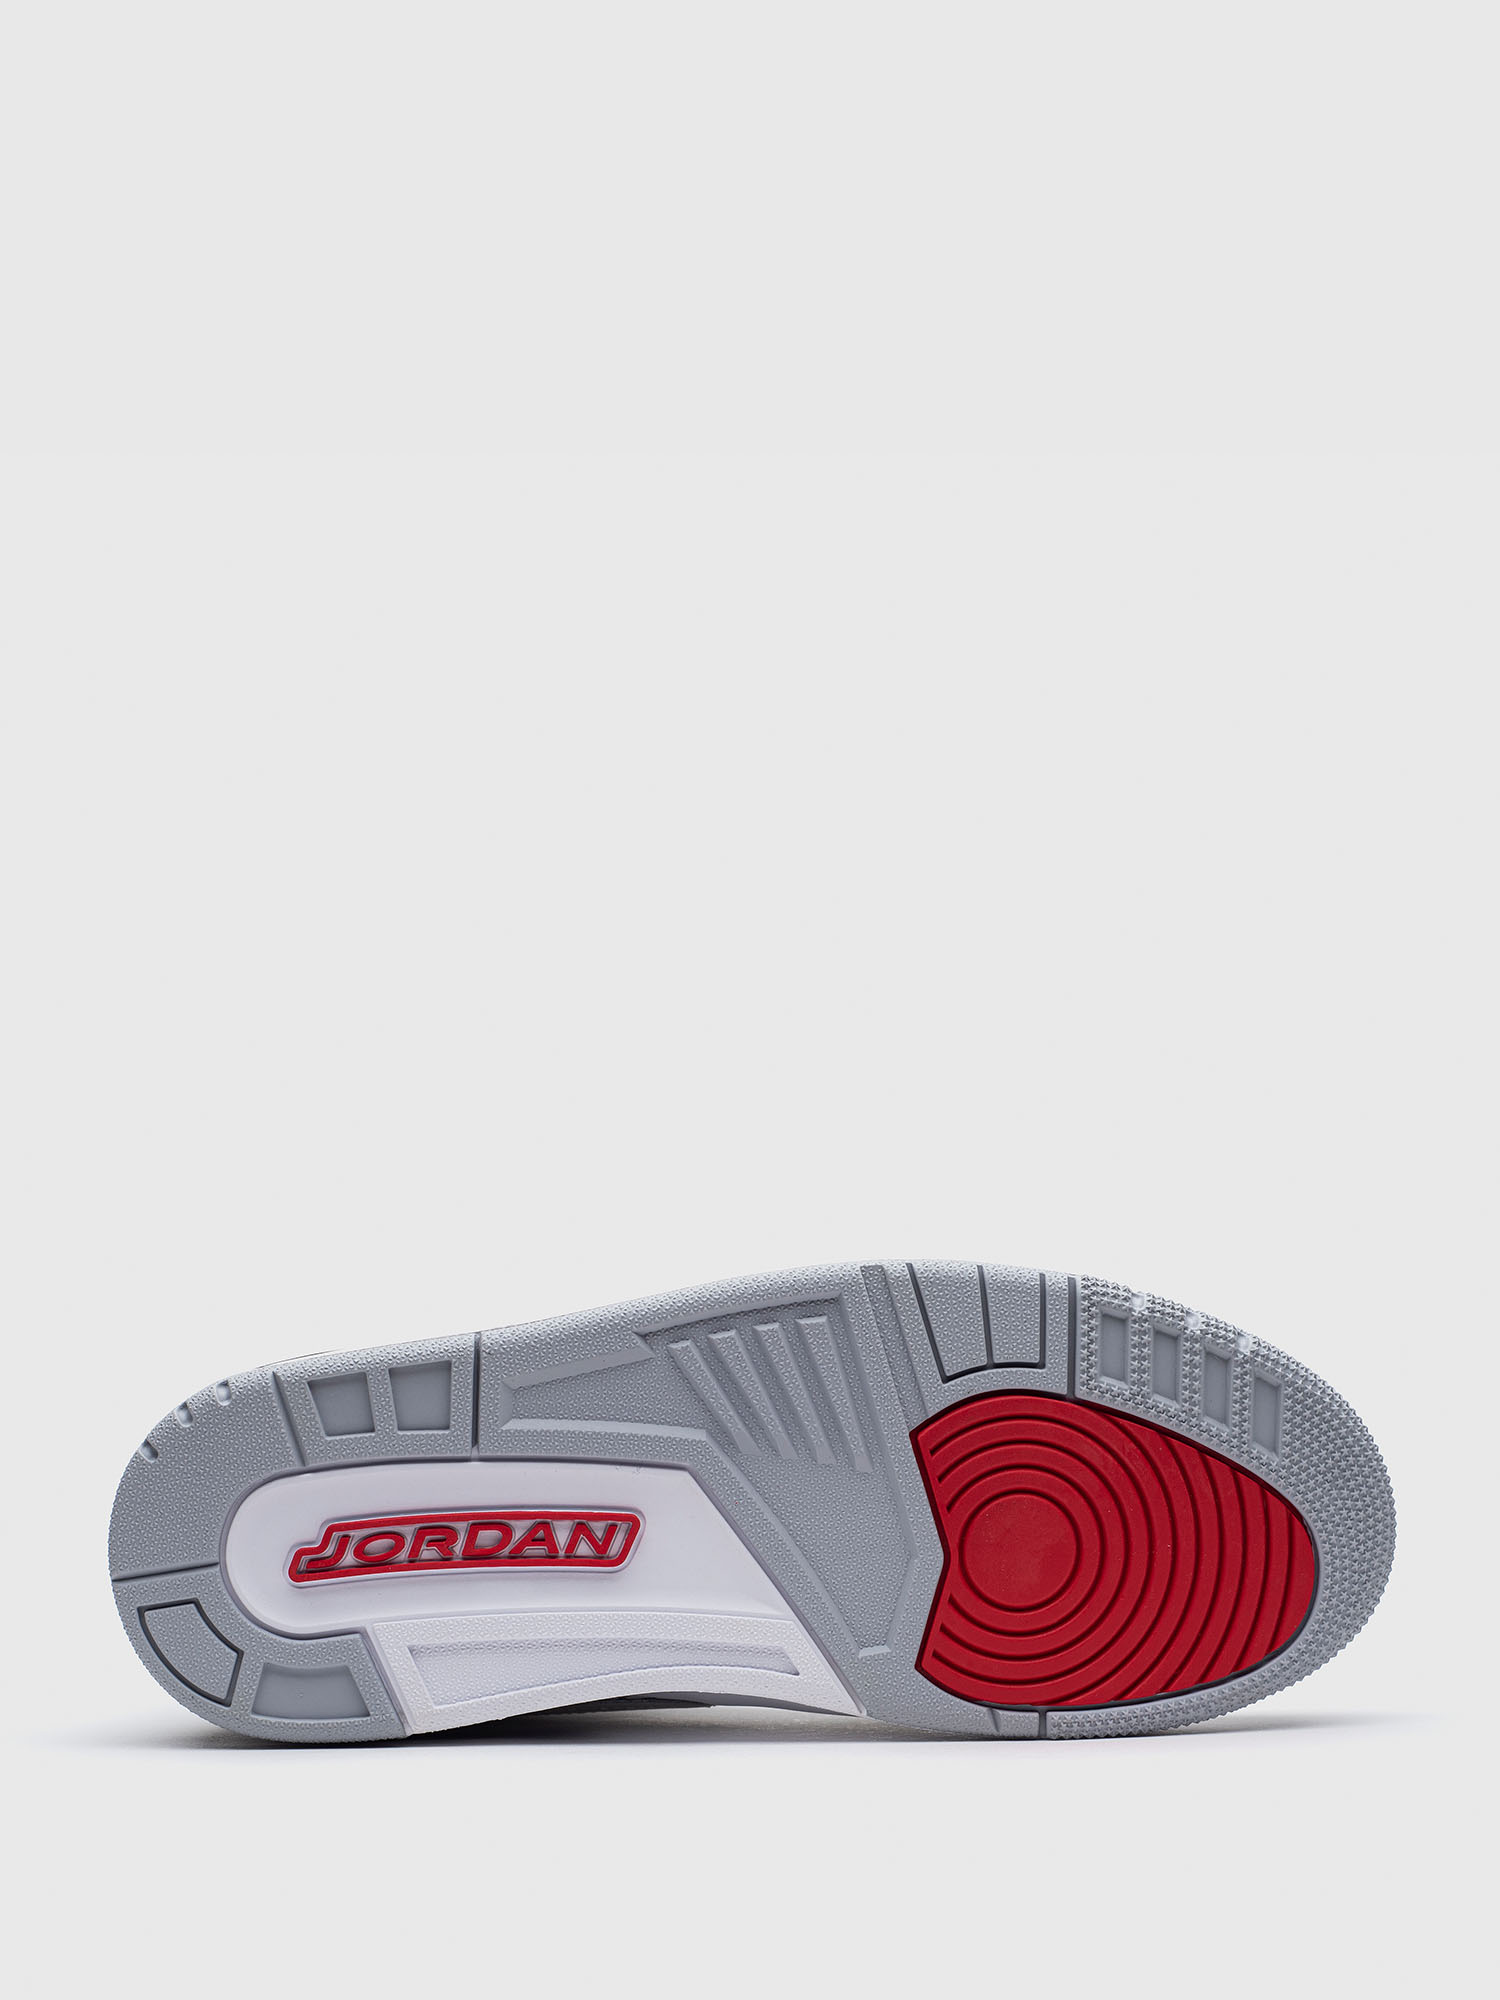 Air Jordan Legacy 312 White-Black